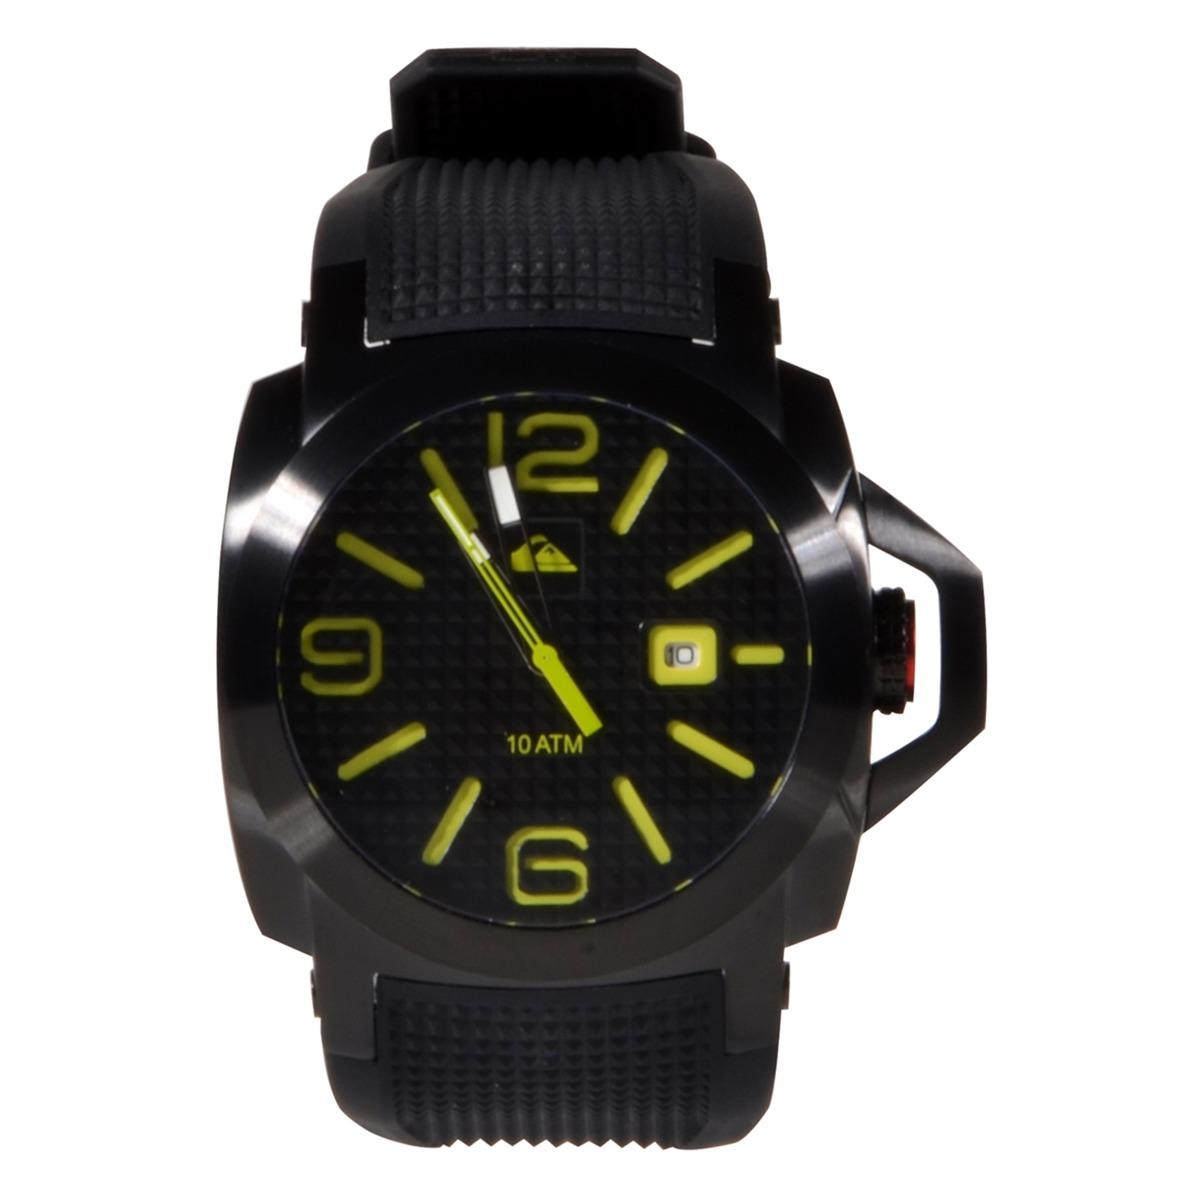 7e692c5ef88 relógio quiksilver luma lanai black lime. Carregando zoom.